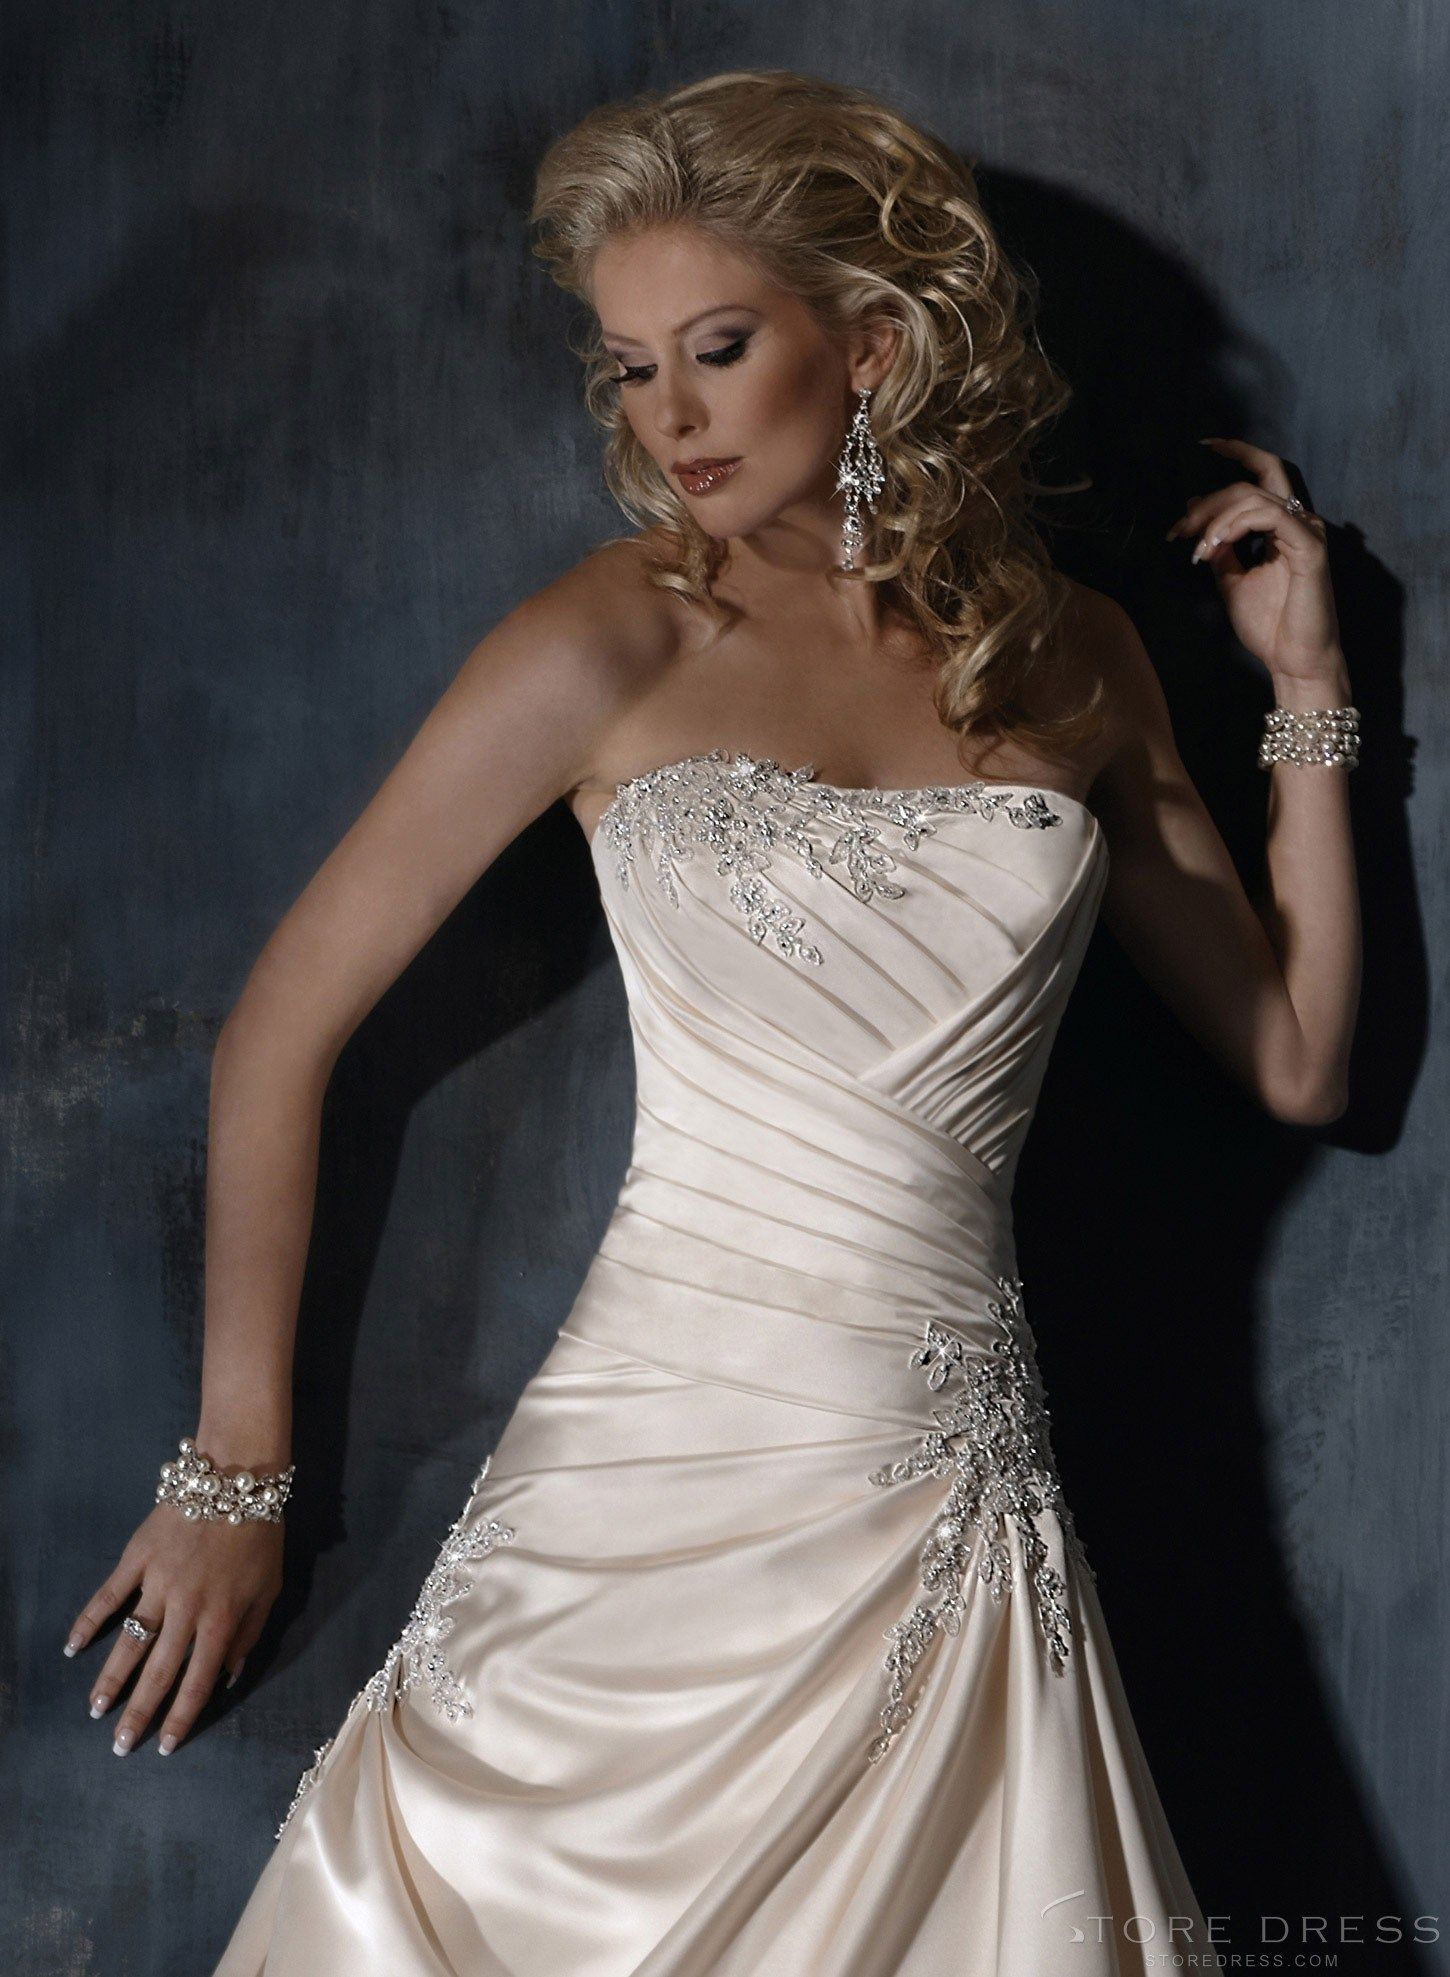 Lovely new arrival style sweetheart wedding dress at storedress